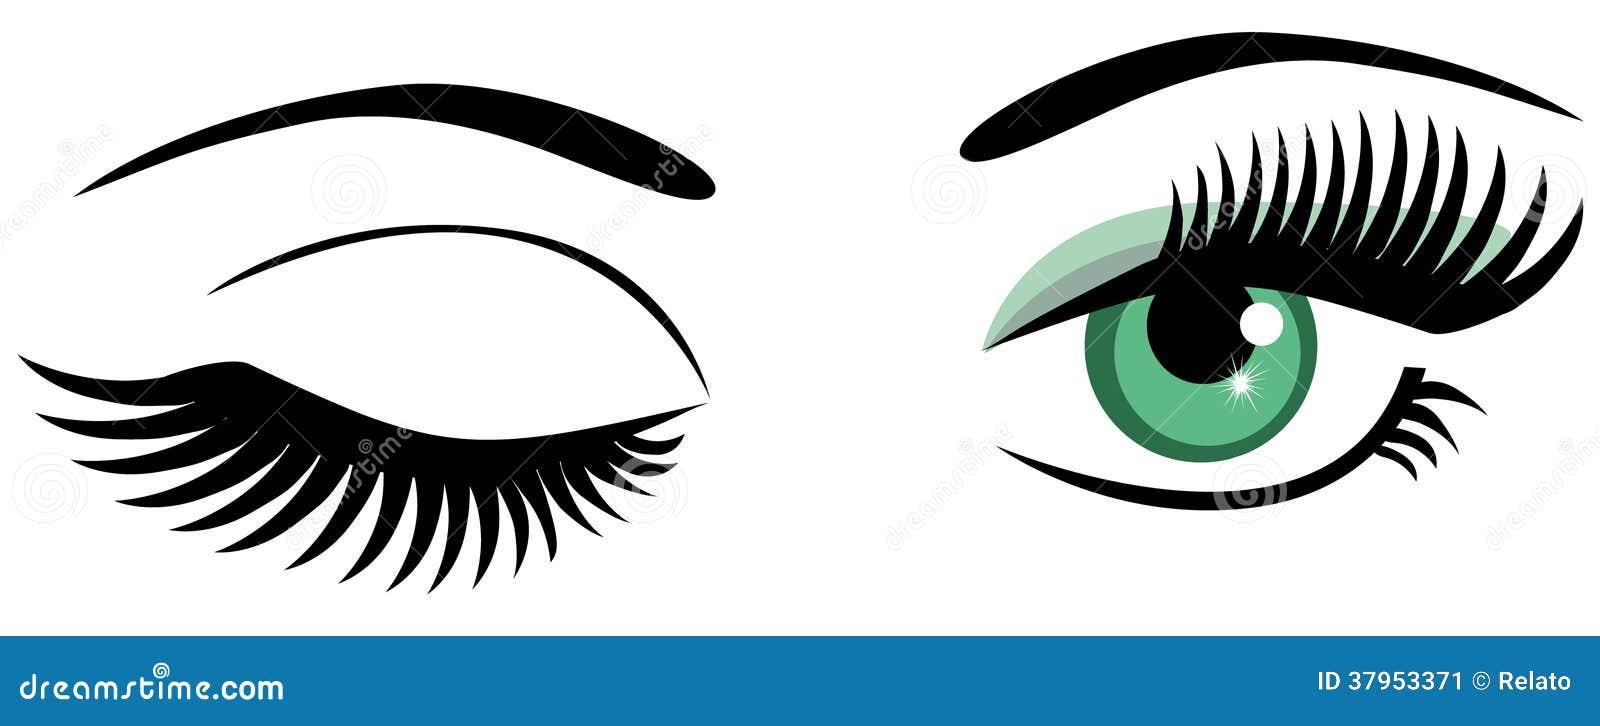 winking stock vector illustration of blue graphic abstract 37953371 rh dreamstime com Cartoon Winking Eye Large Winking Eye Clip Art